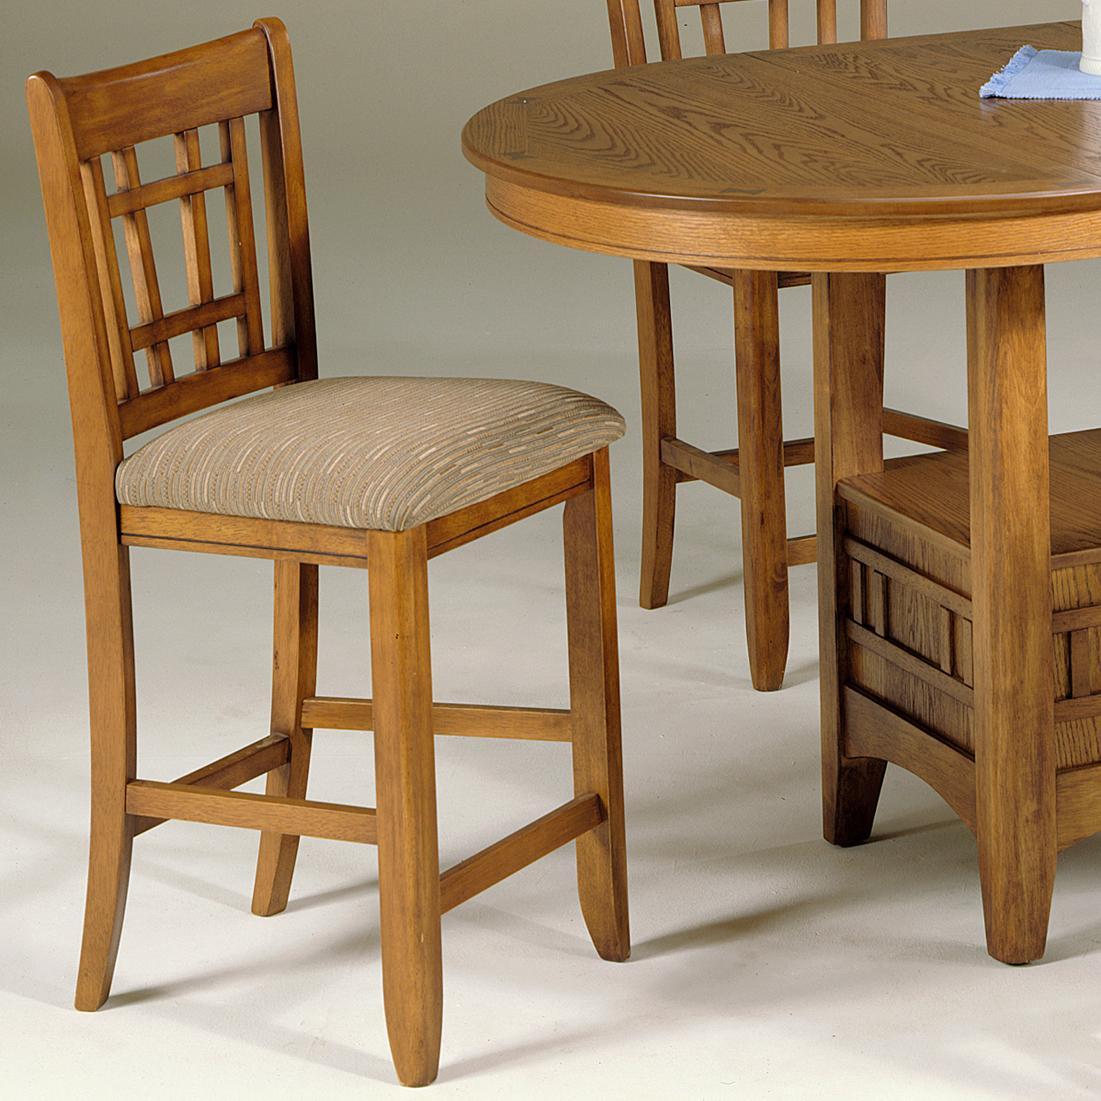 Liberty Furniture Santa Rosa 24 Inch Upholstered Barstool